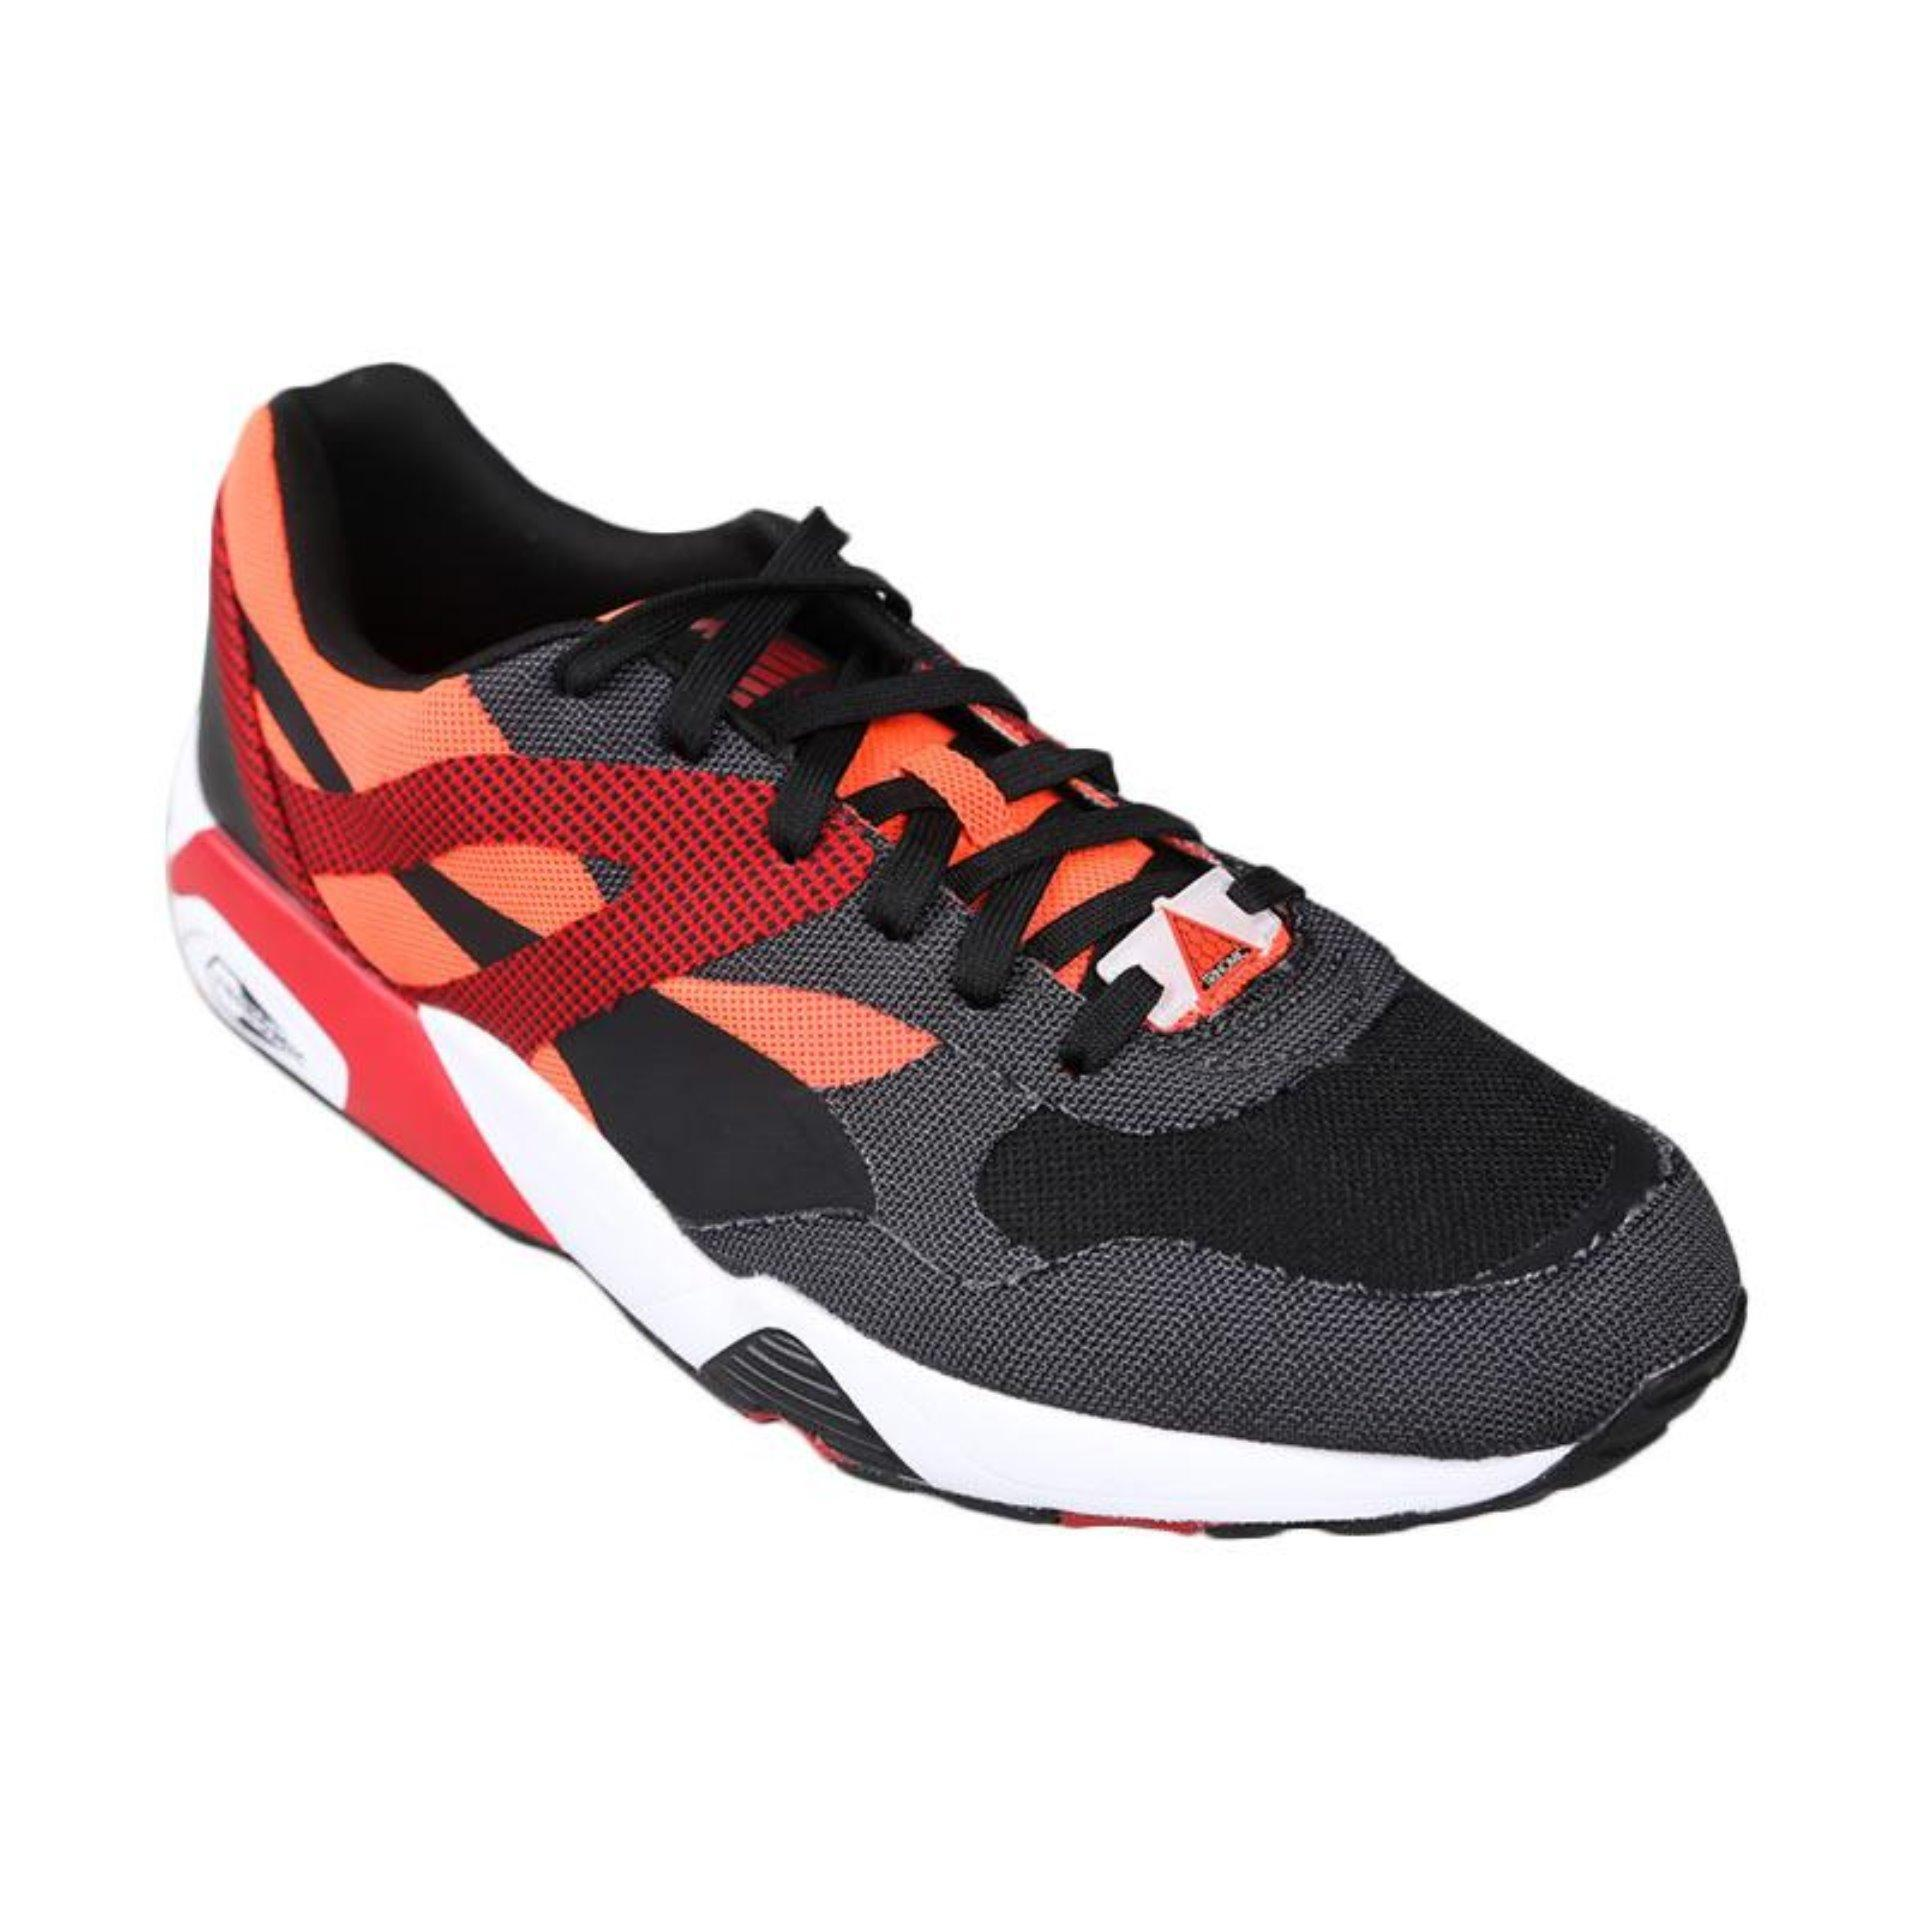 Jual Puma Sepatu Sneaker R698 Progressive 36204601 Antik